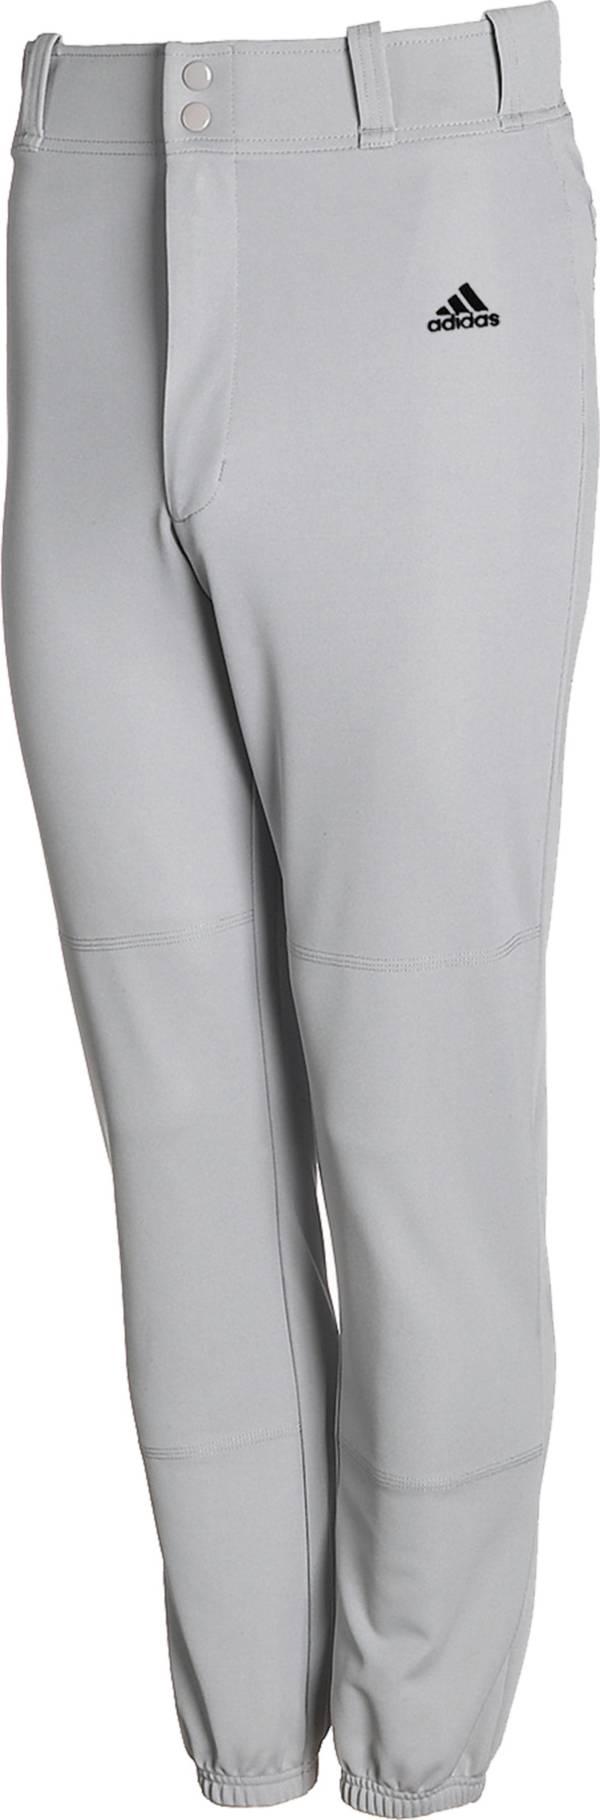 adidas Boys' Incite Closed Bottom Baseball Pants product image